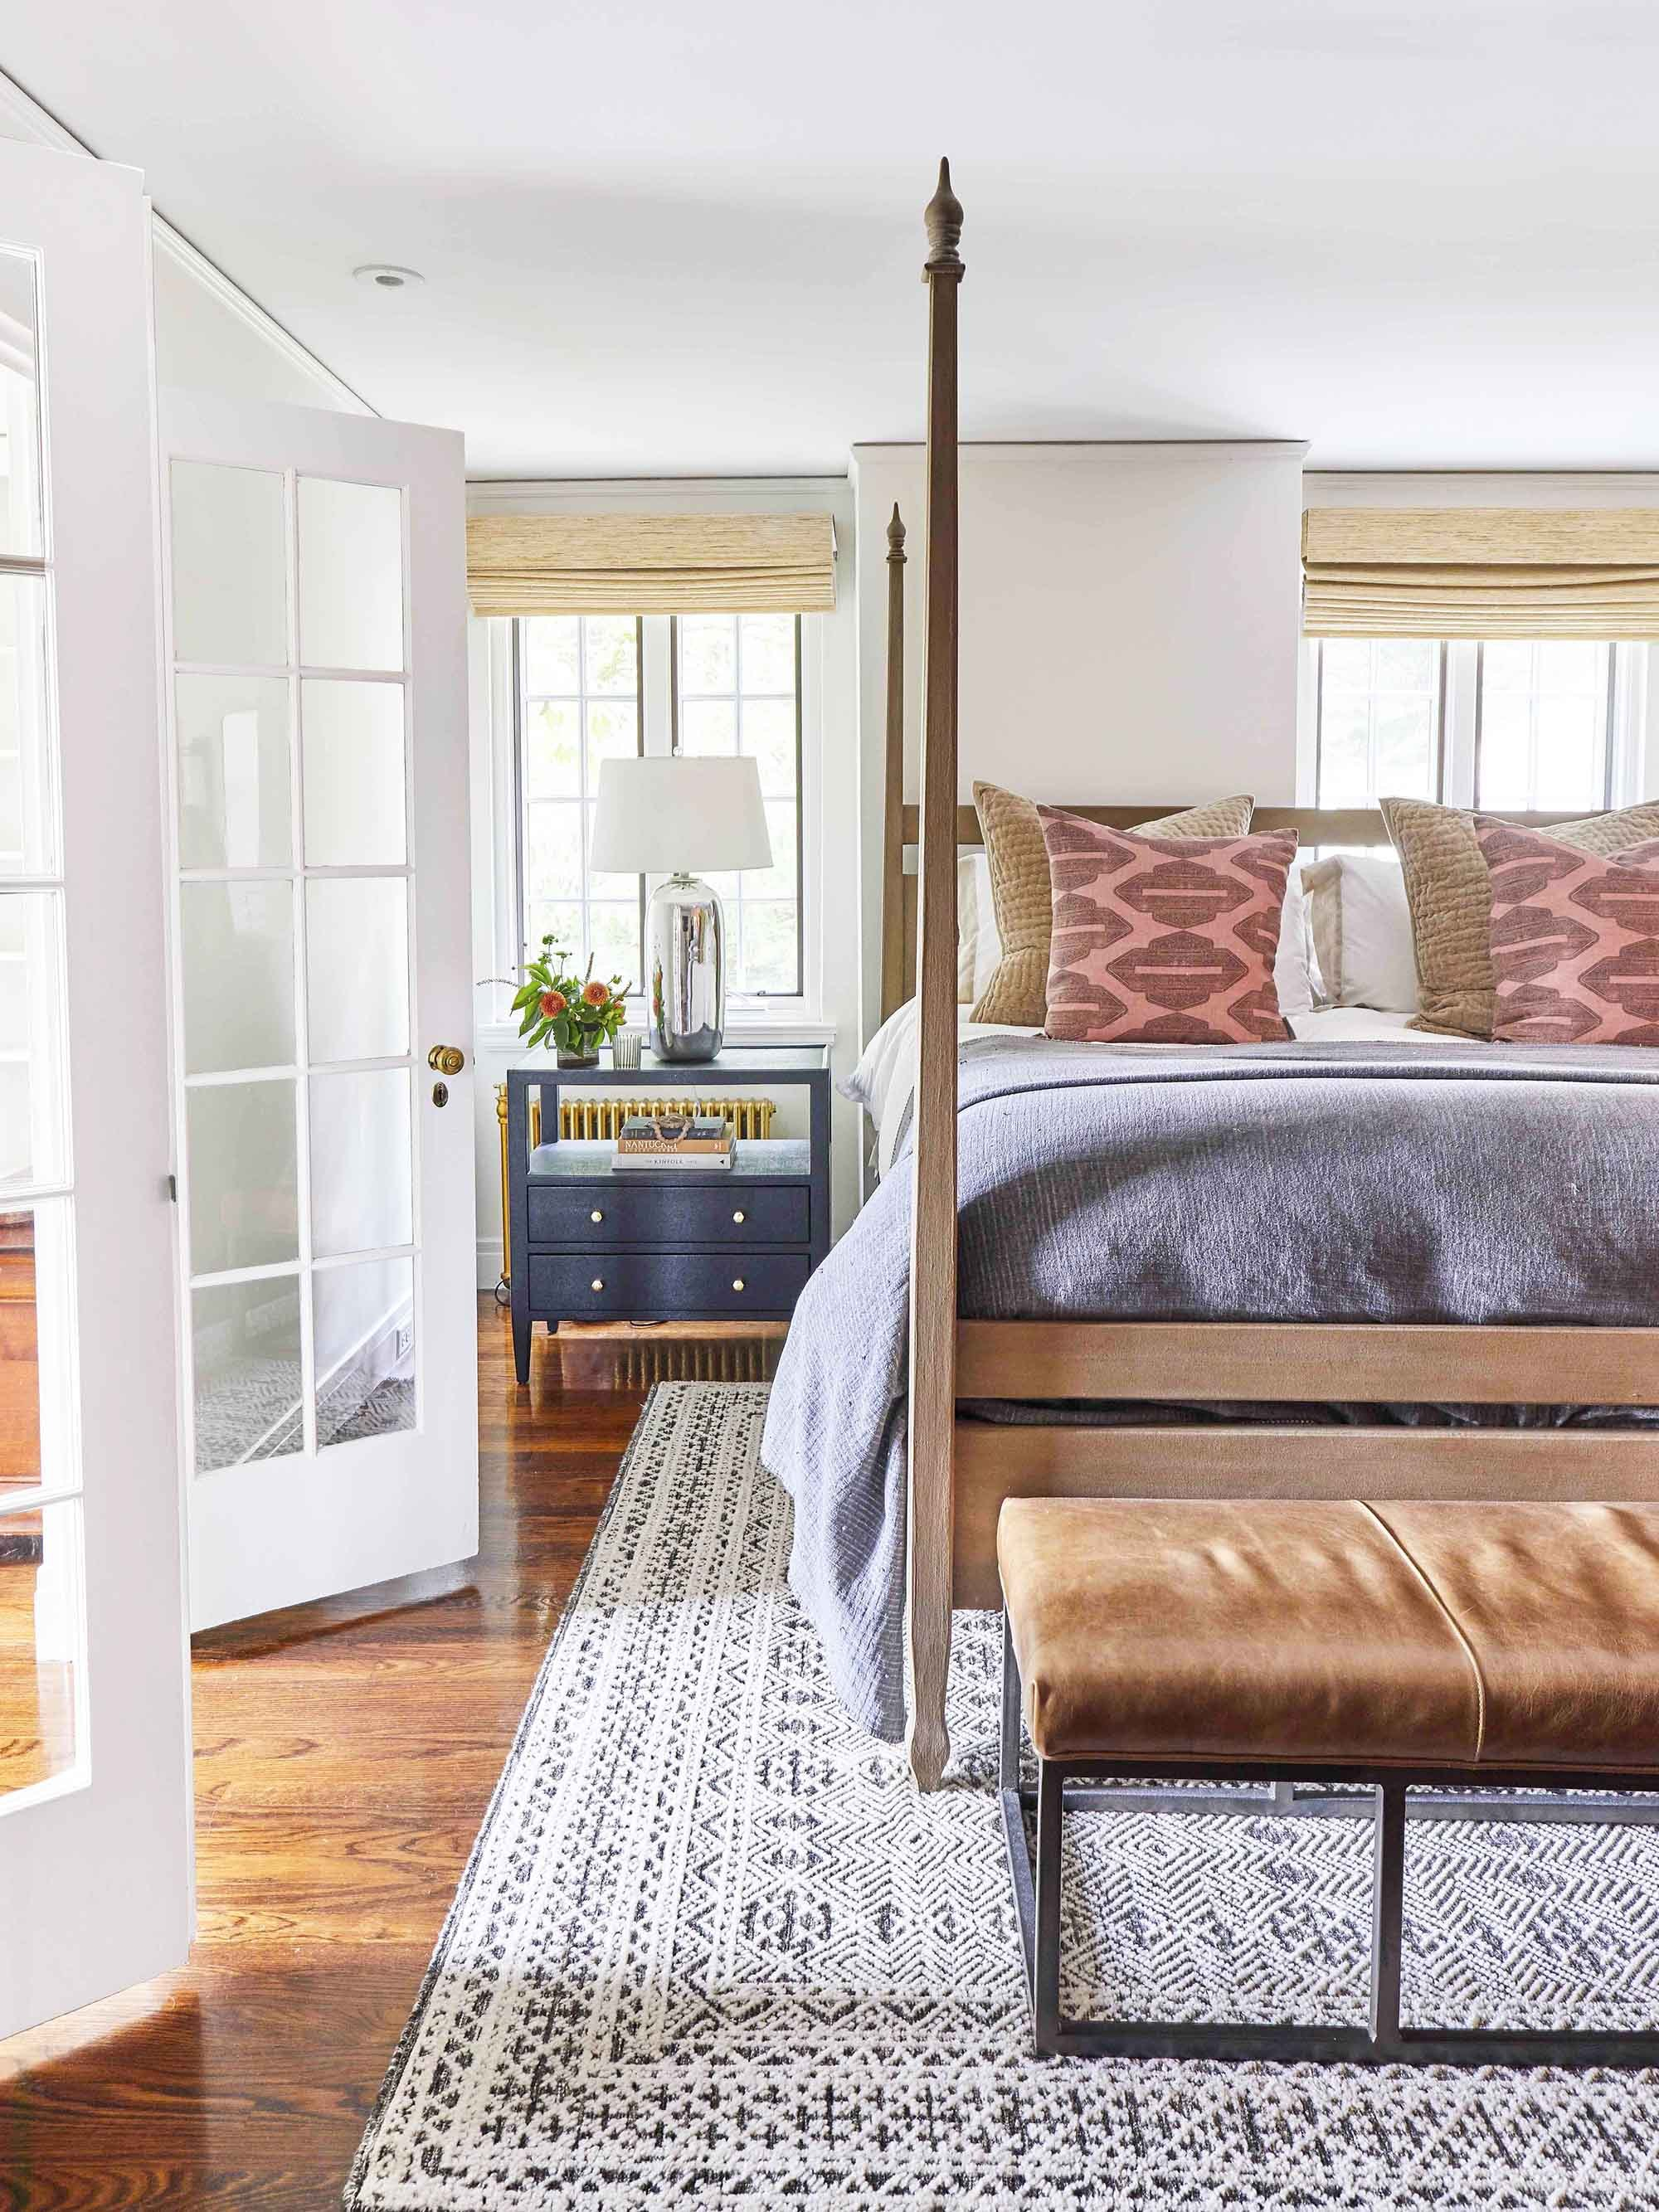 mackenzie-and-company-interior-design-westwood-boston-ma-2.jpg